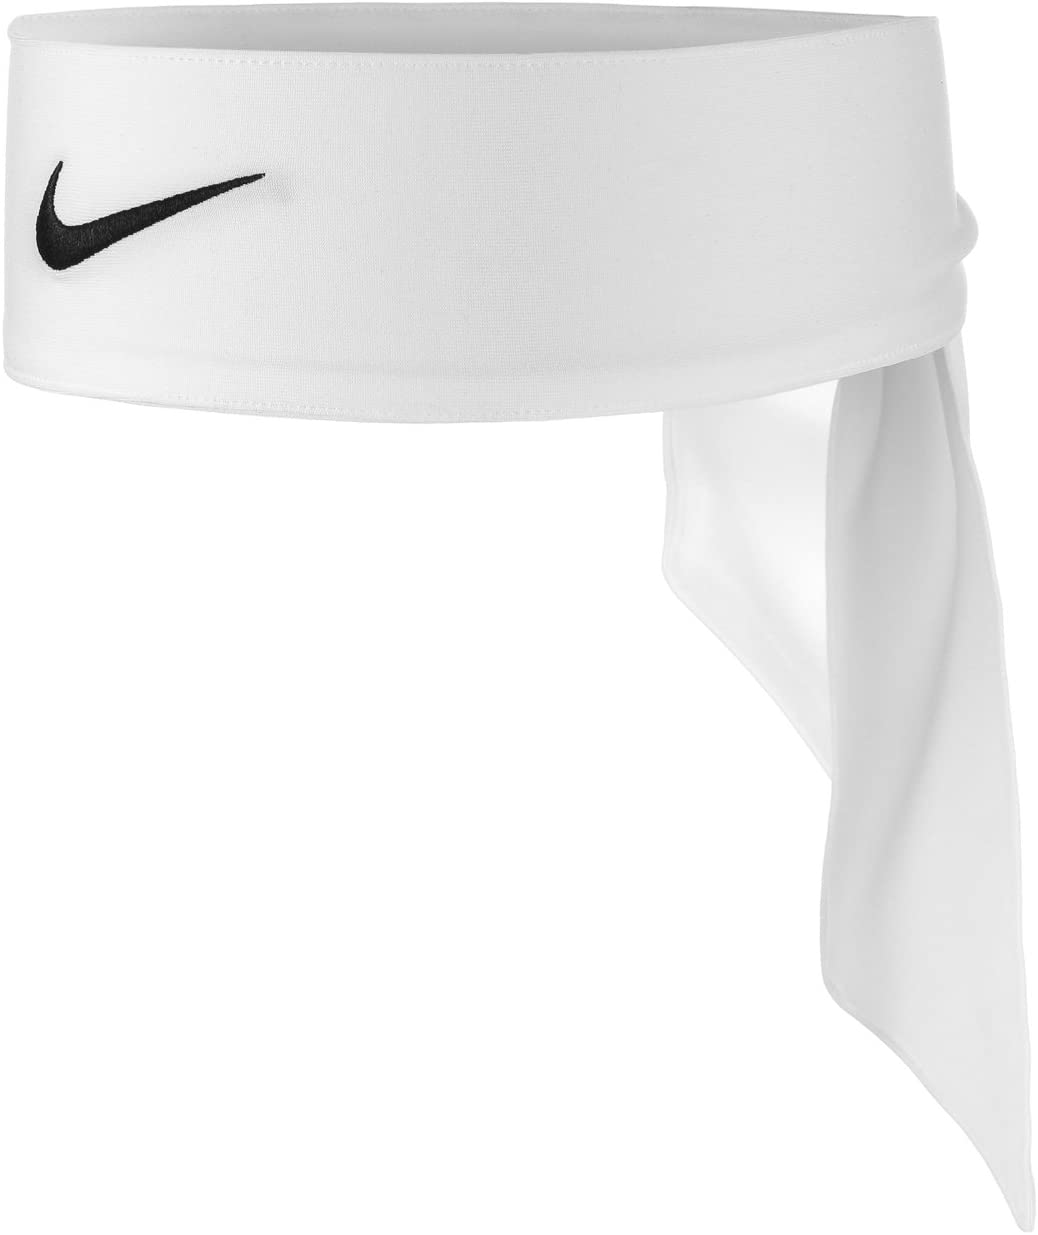 Nike Unisex Dri-Fit Head Tie 2.0 White/Black One Size: Sports & Outdoors